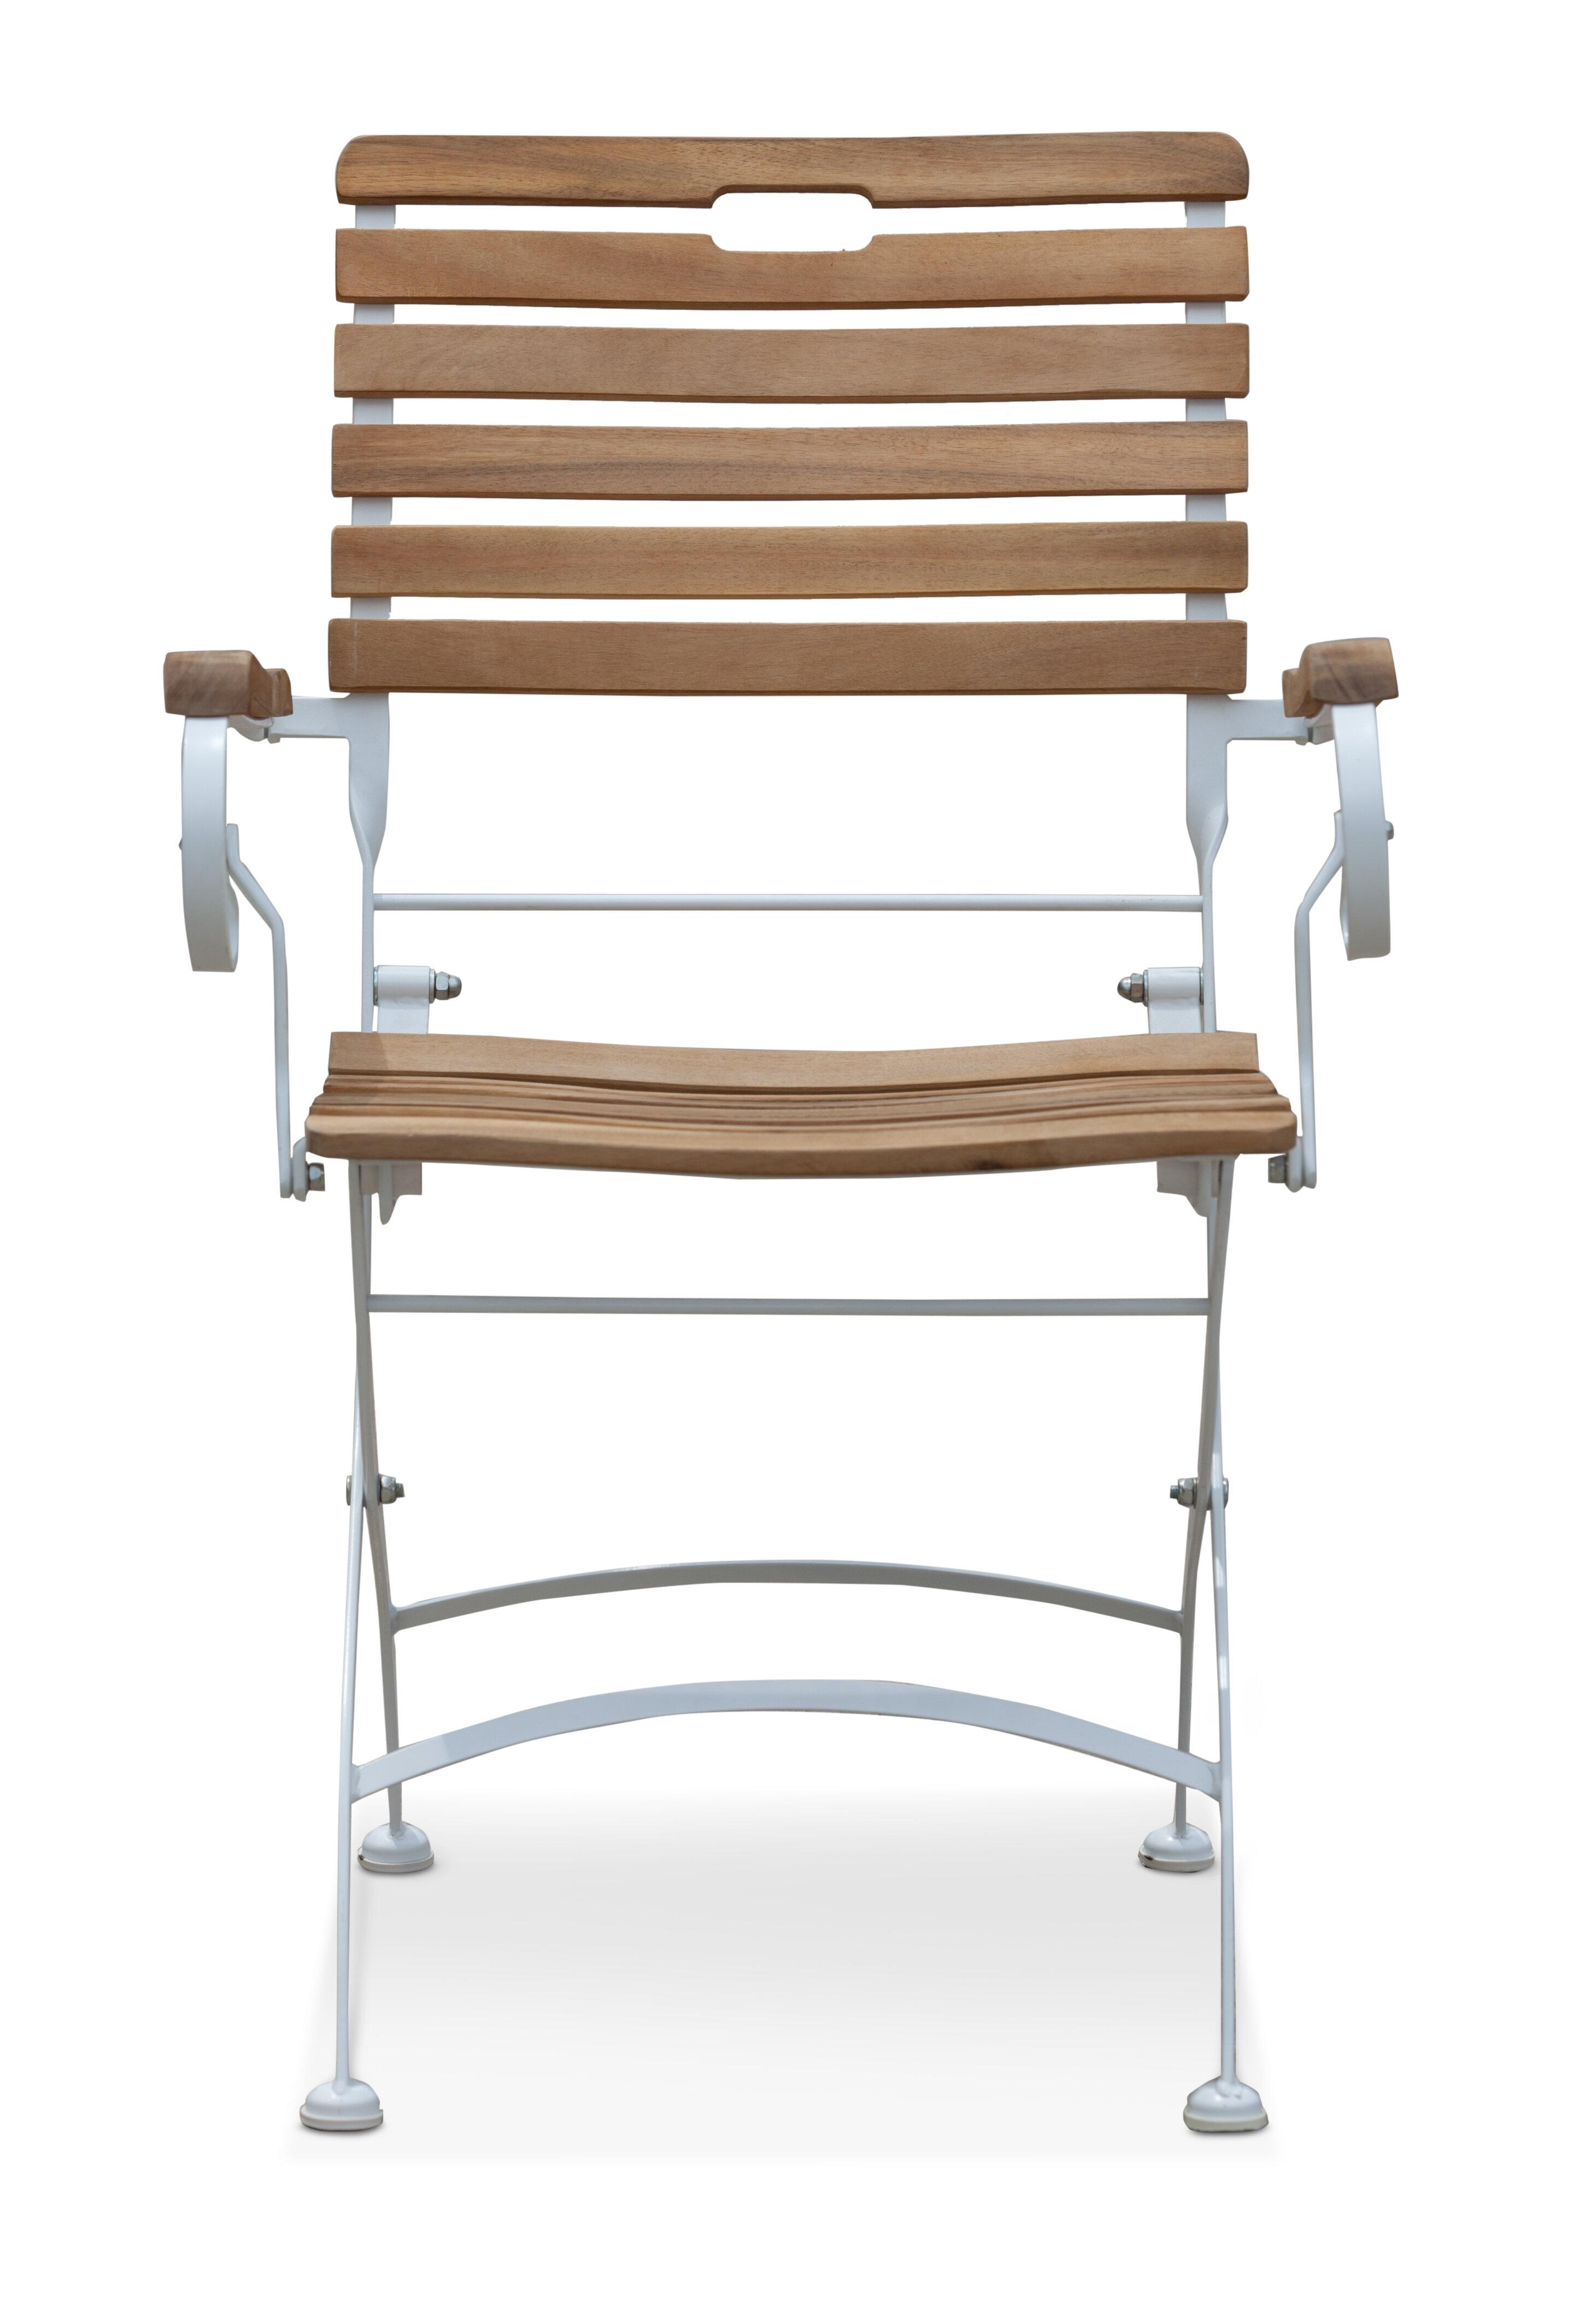 Lanterfant eva folding dining chair reviews wayfair co uk